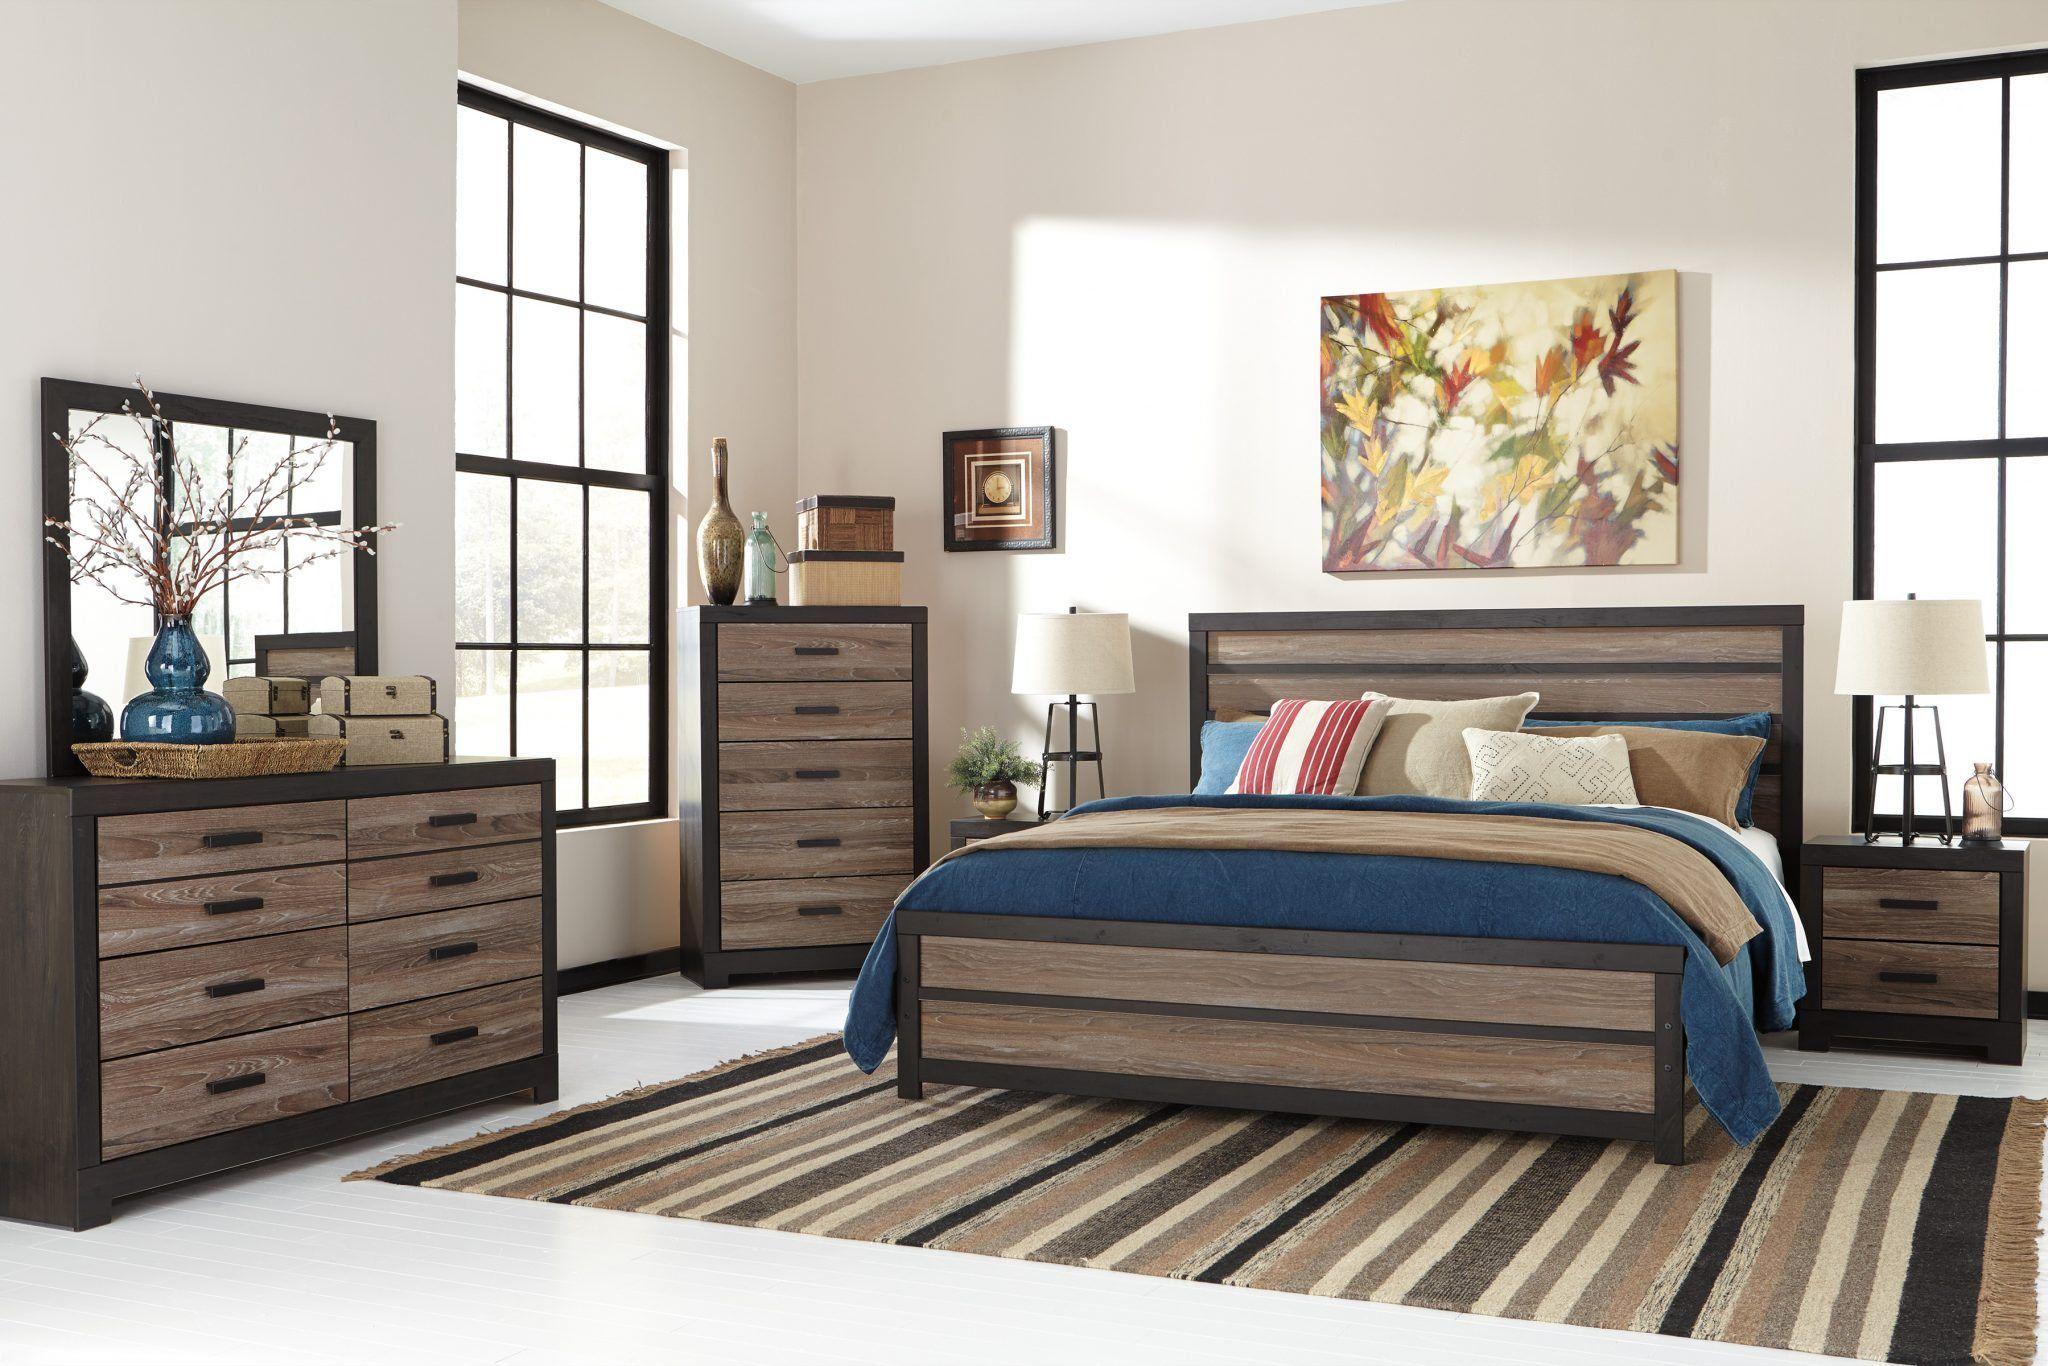 Bedroom furniture sets deals design ideas pinterest